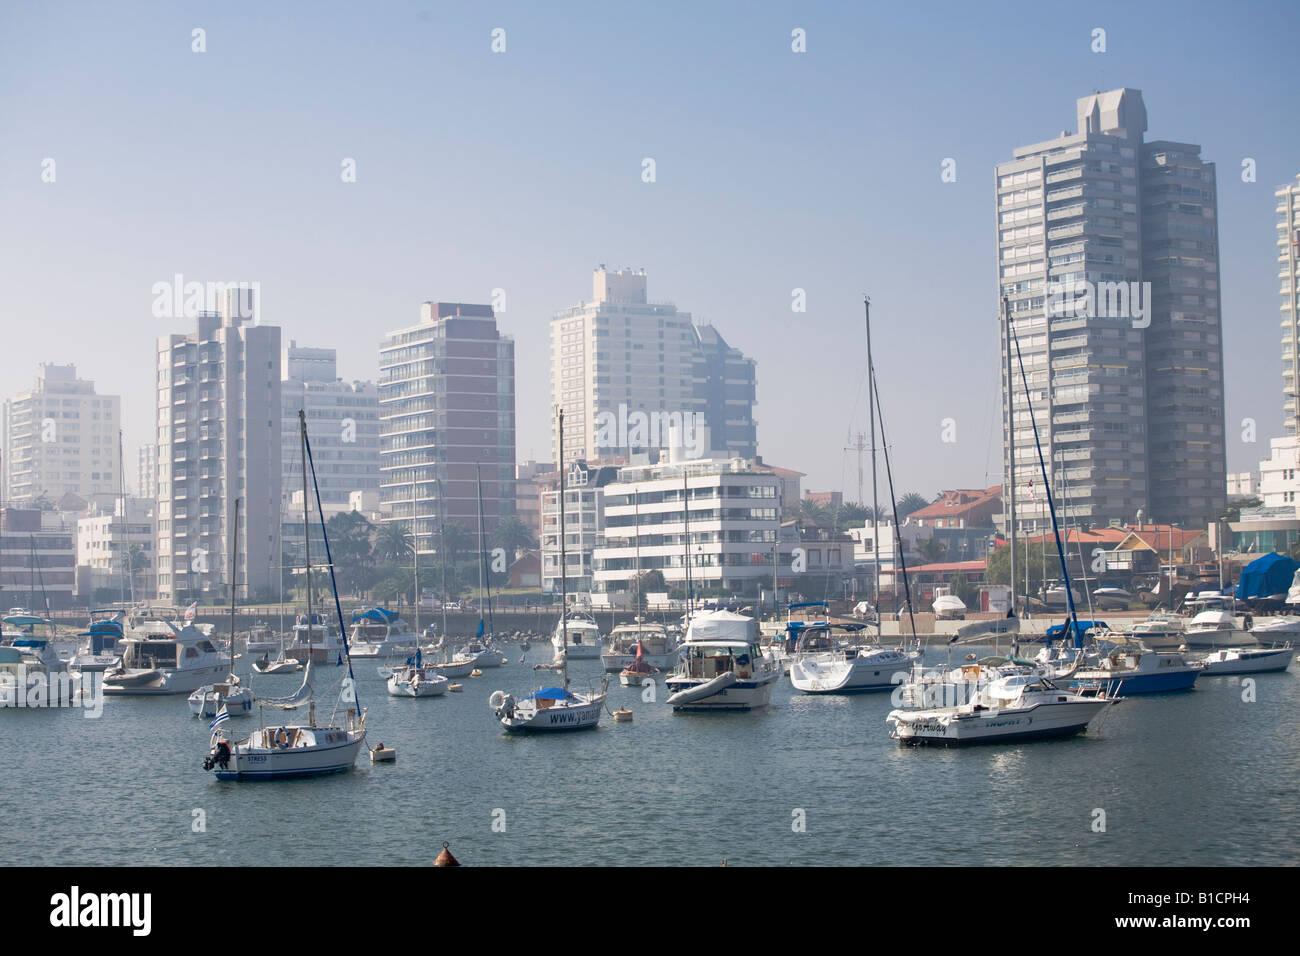 The port of Punta del Este Uruguay - Stock Image